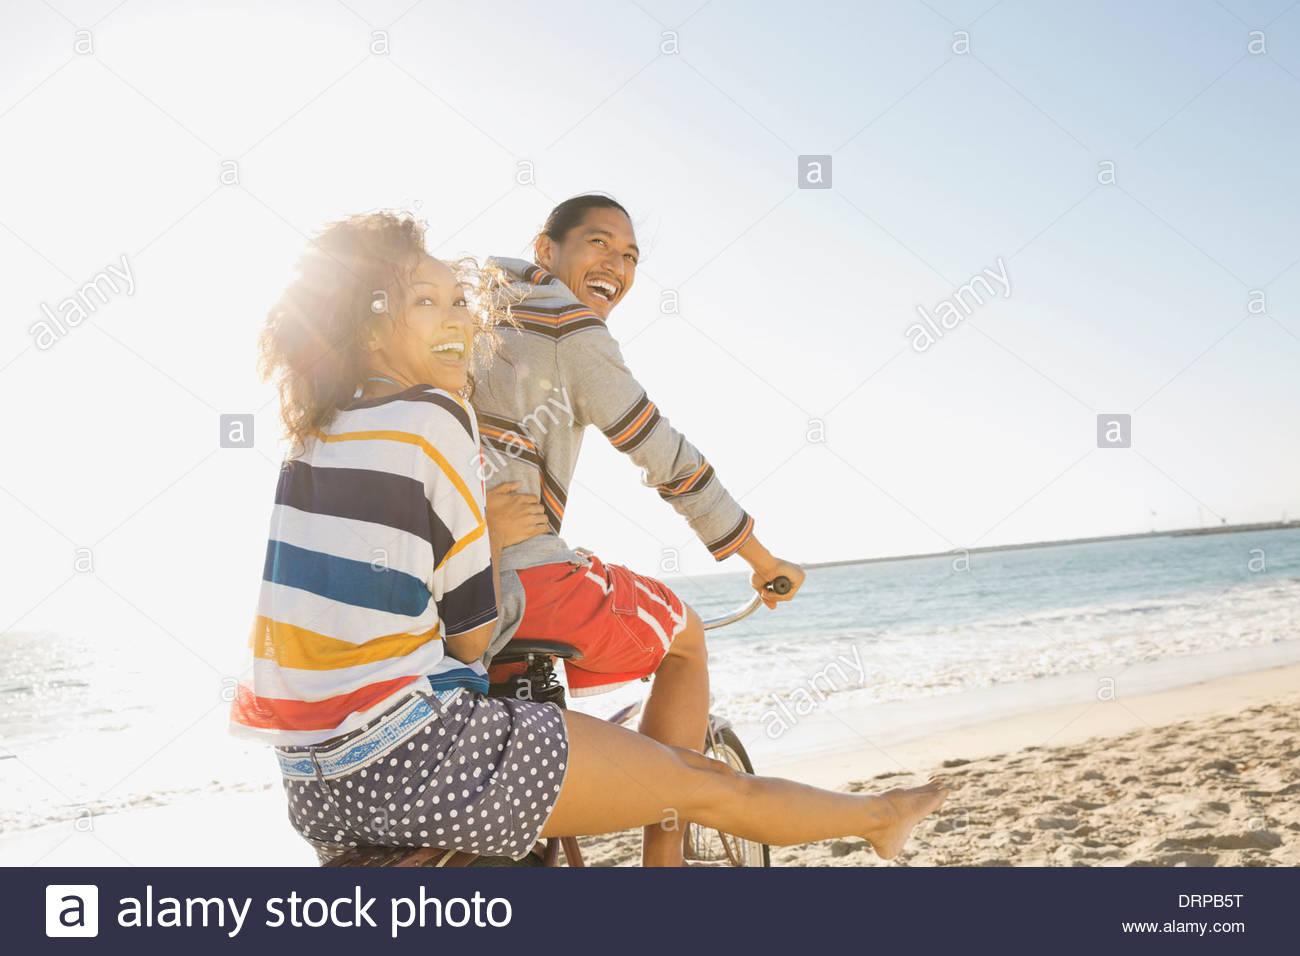 Couple enjoying bicycle ride on beach - Stock Image